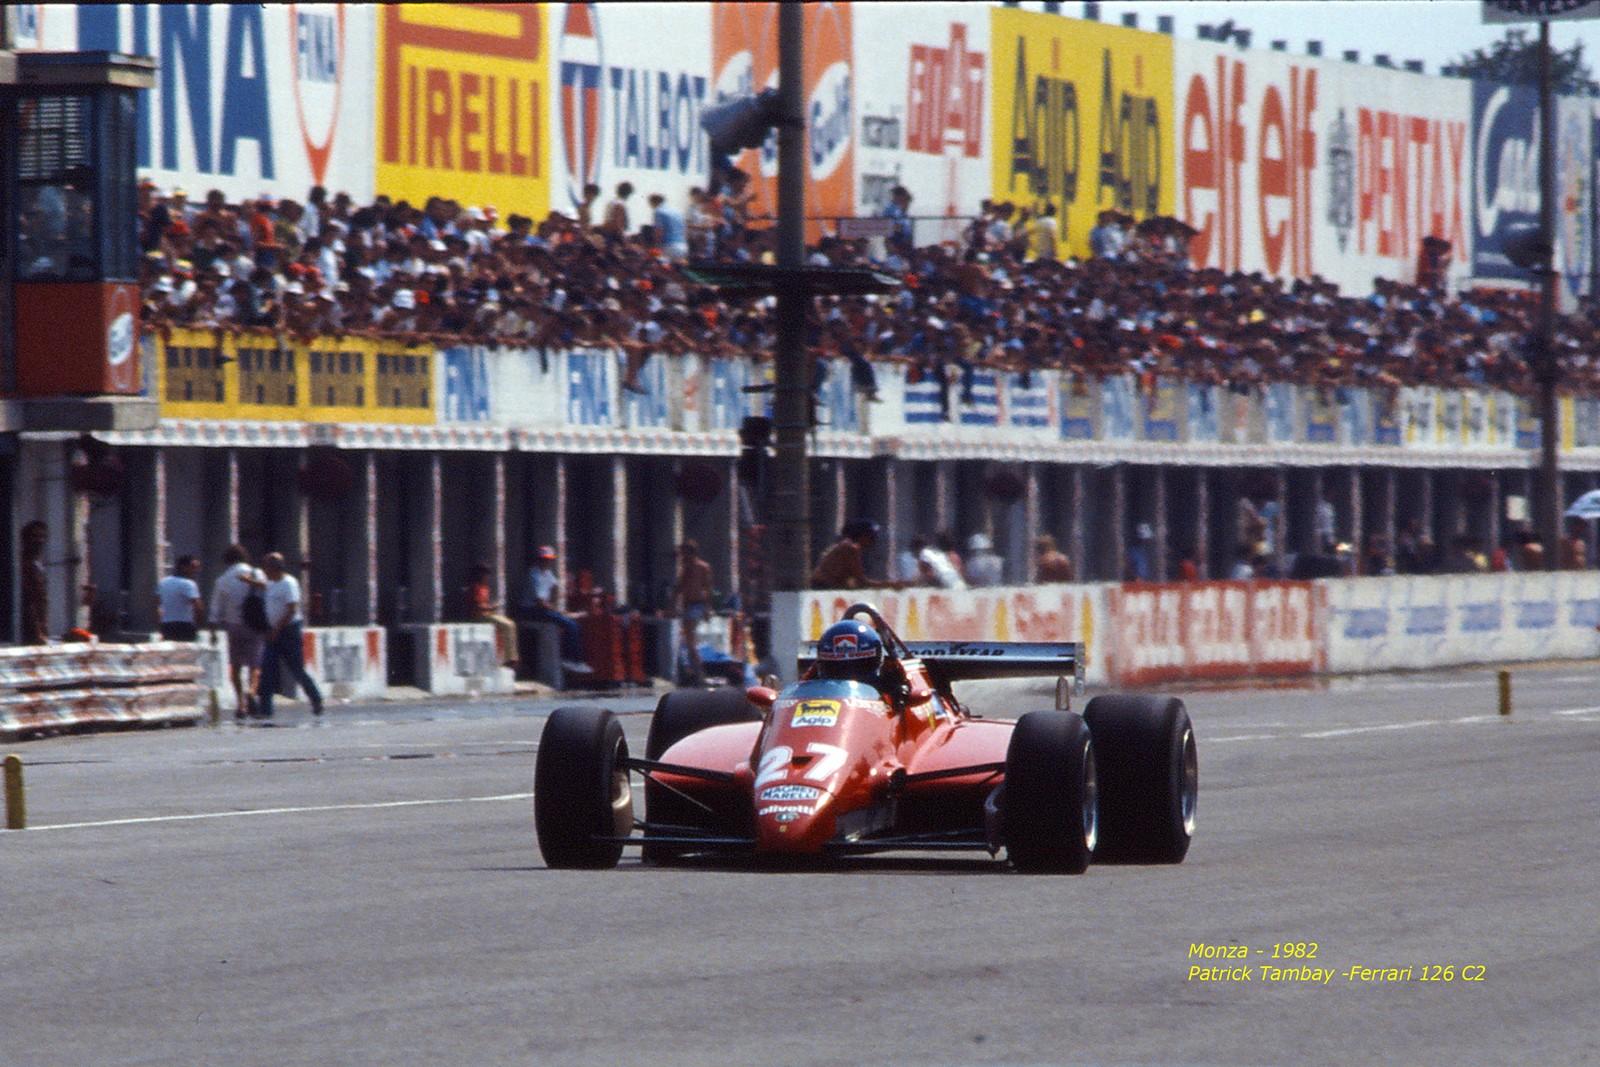 Patrick Tambay - Monza - 1982...